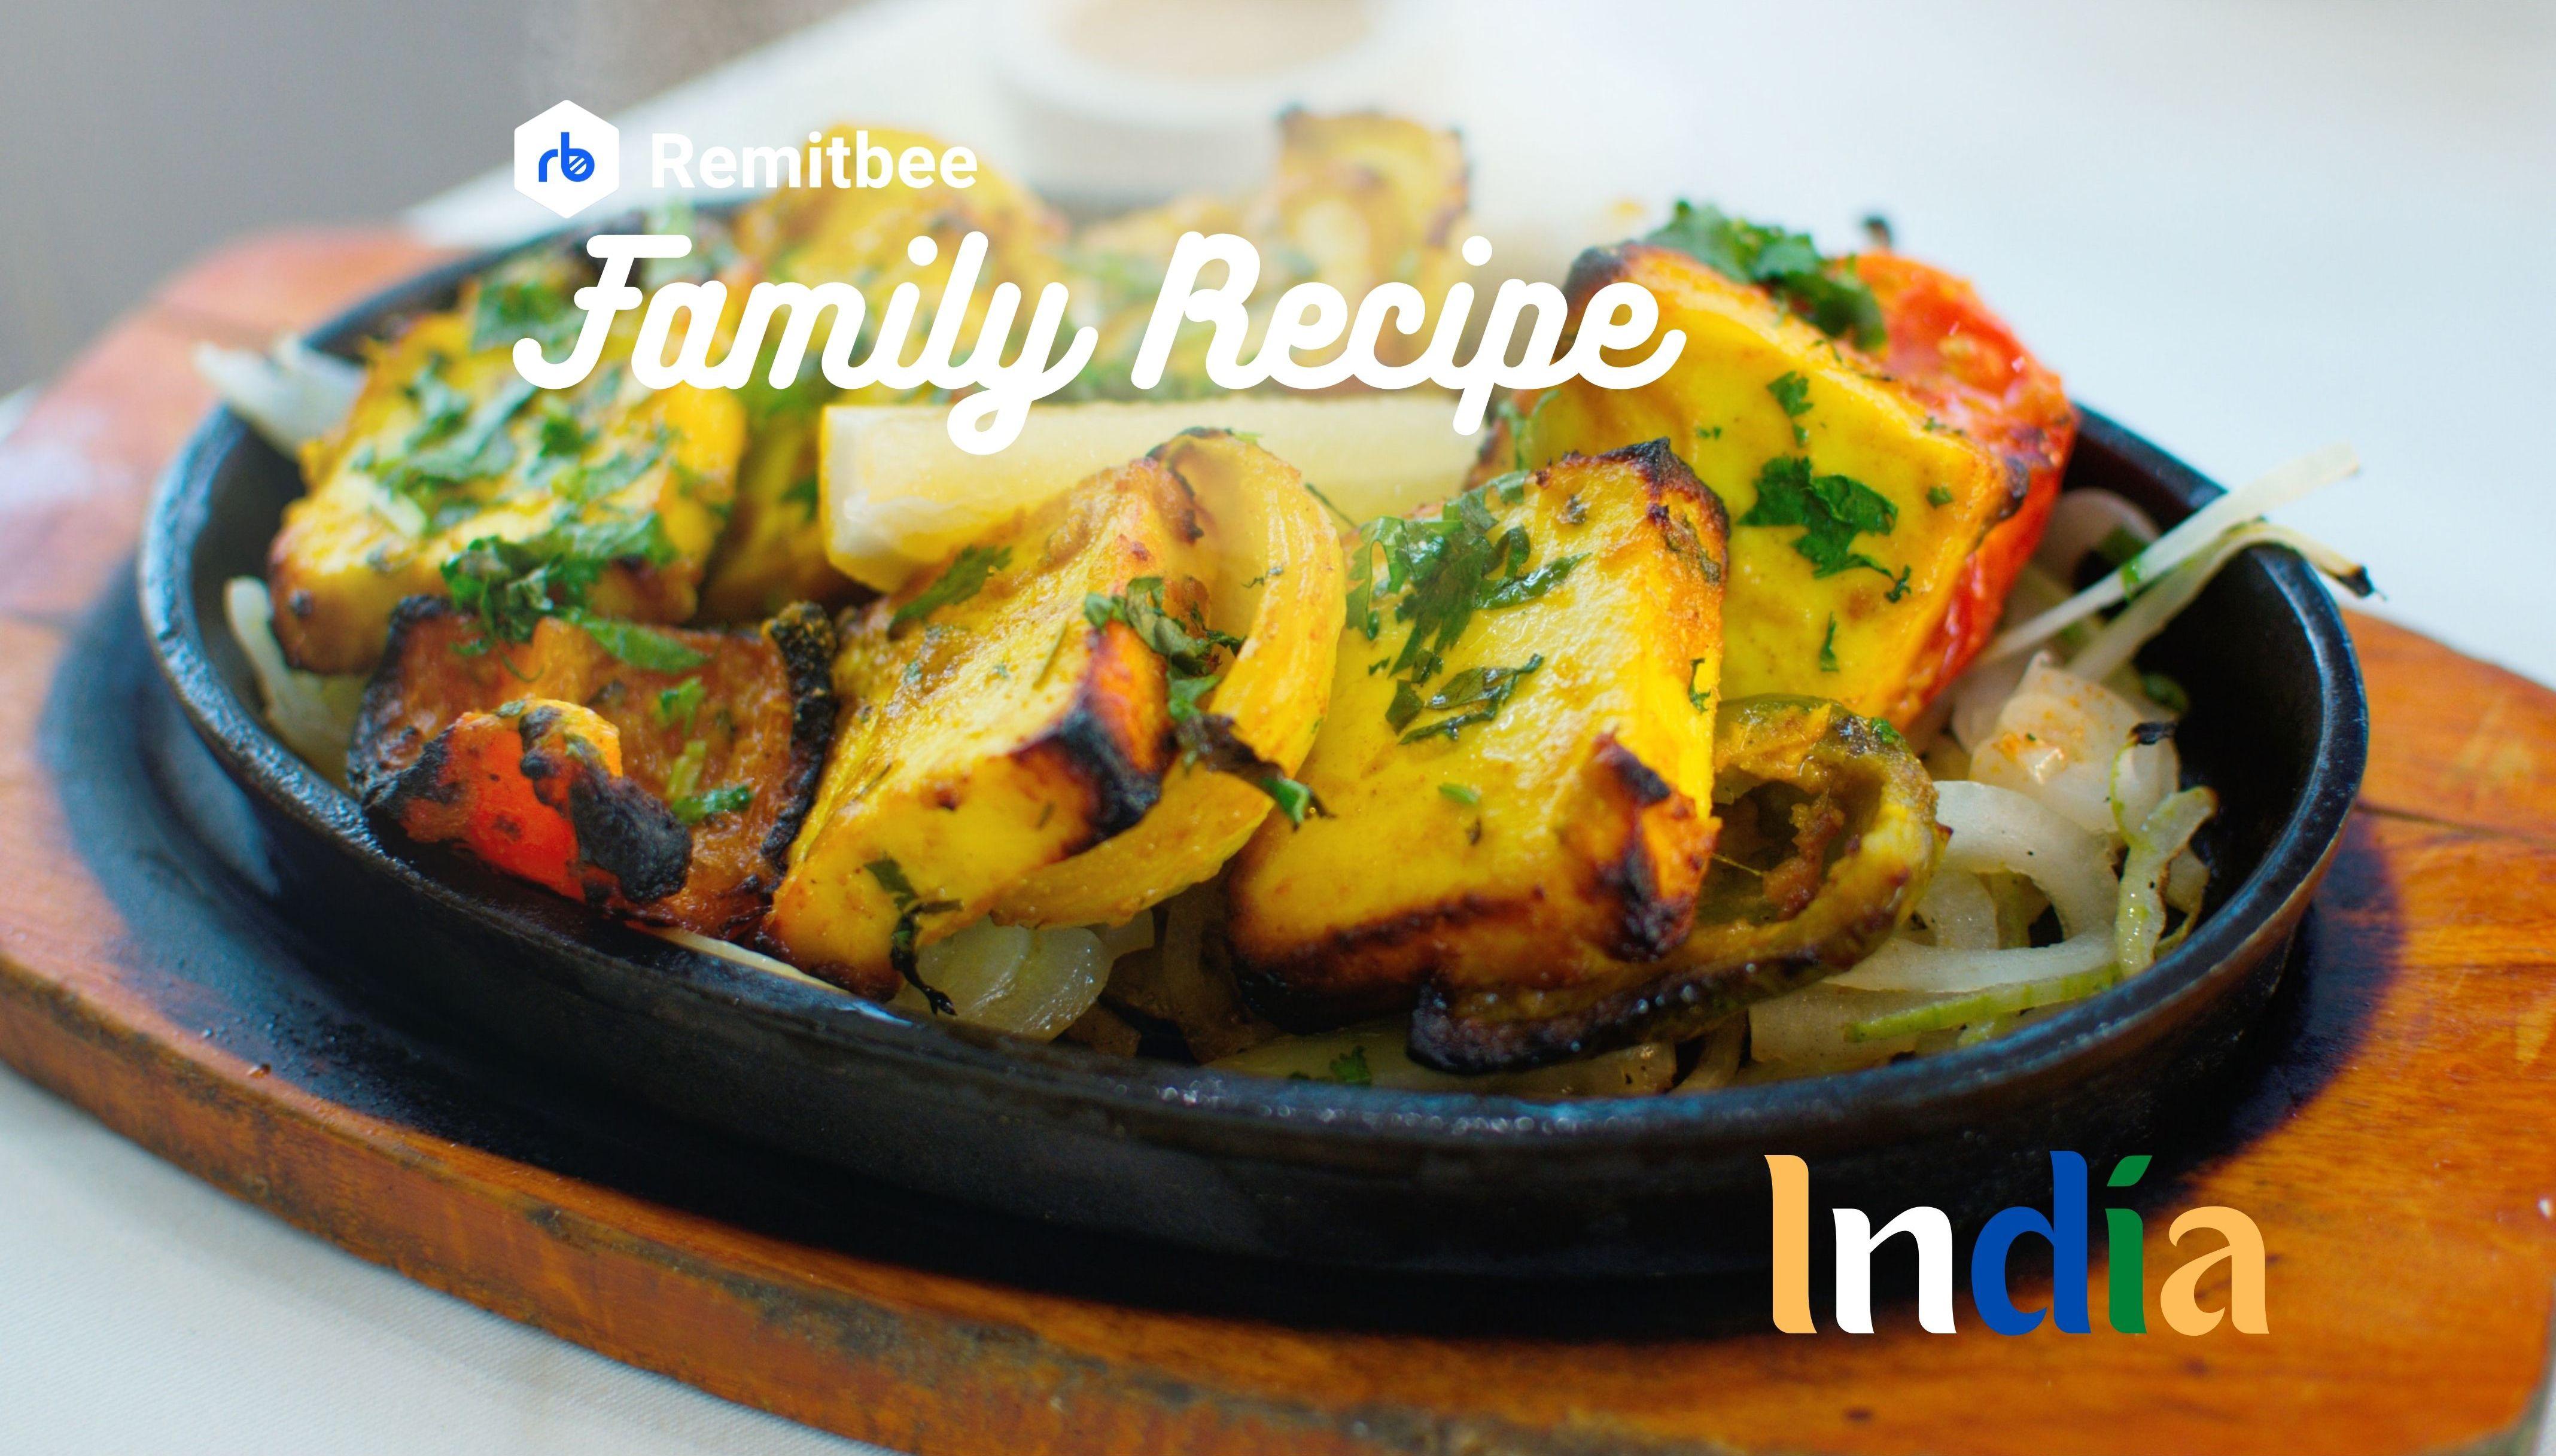 Remitbee Family Recipe: Paneer Masala .